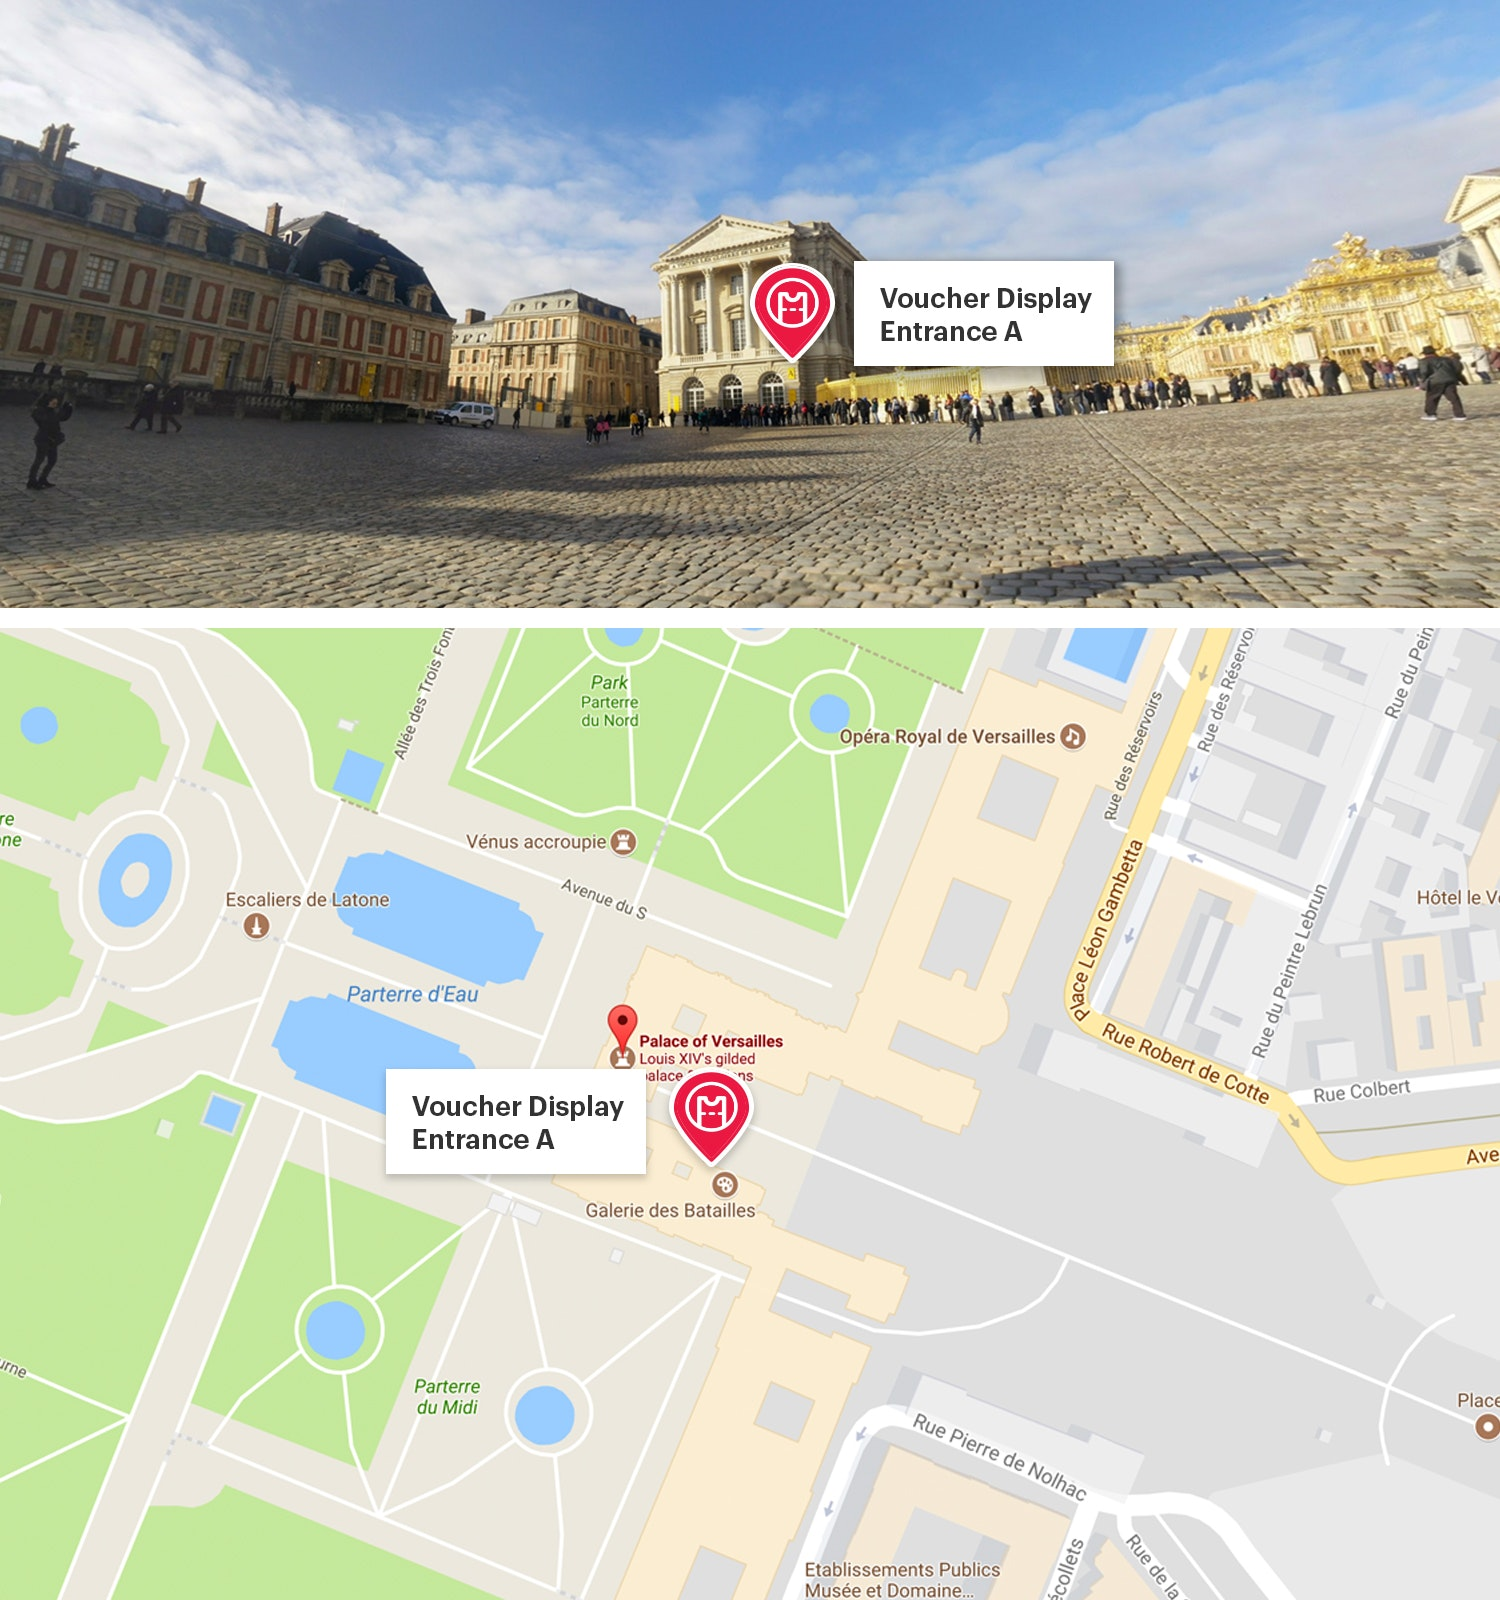 Palazzo di Versailles Map